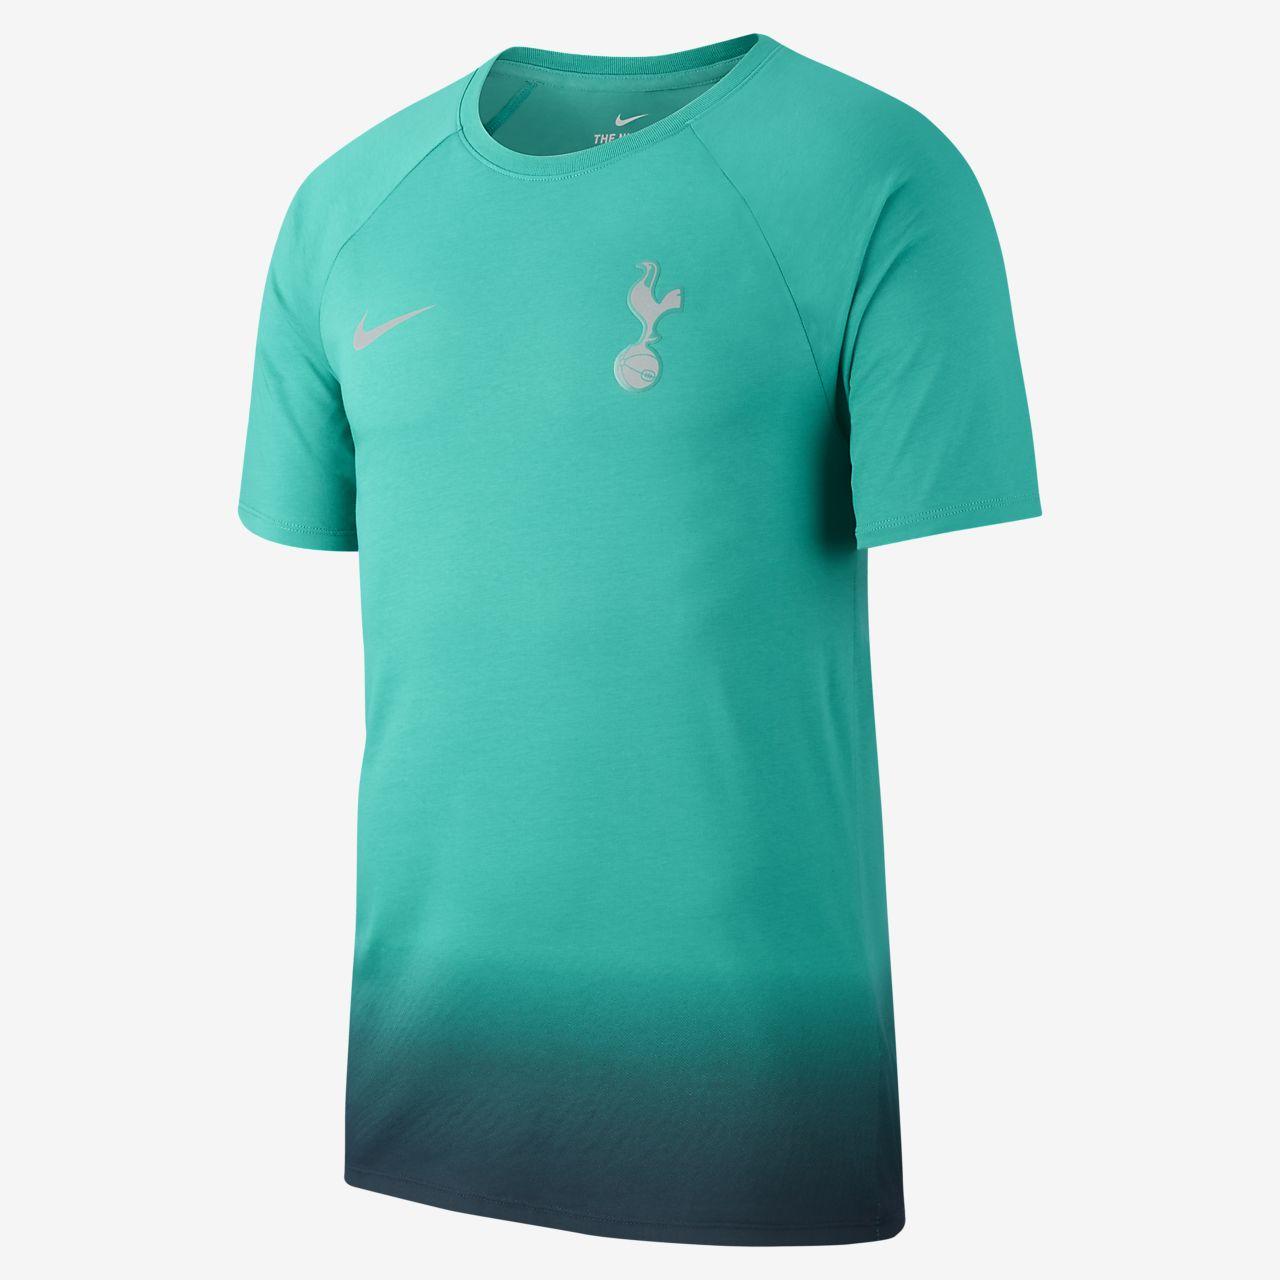 Tottenham Hotspur FC Dri-FIT Match Men s T-Shirt. Nike.com ZA 8efa05f1b